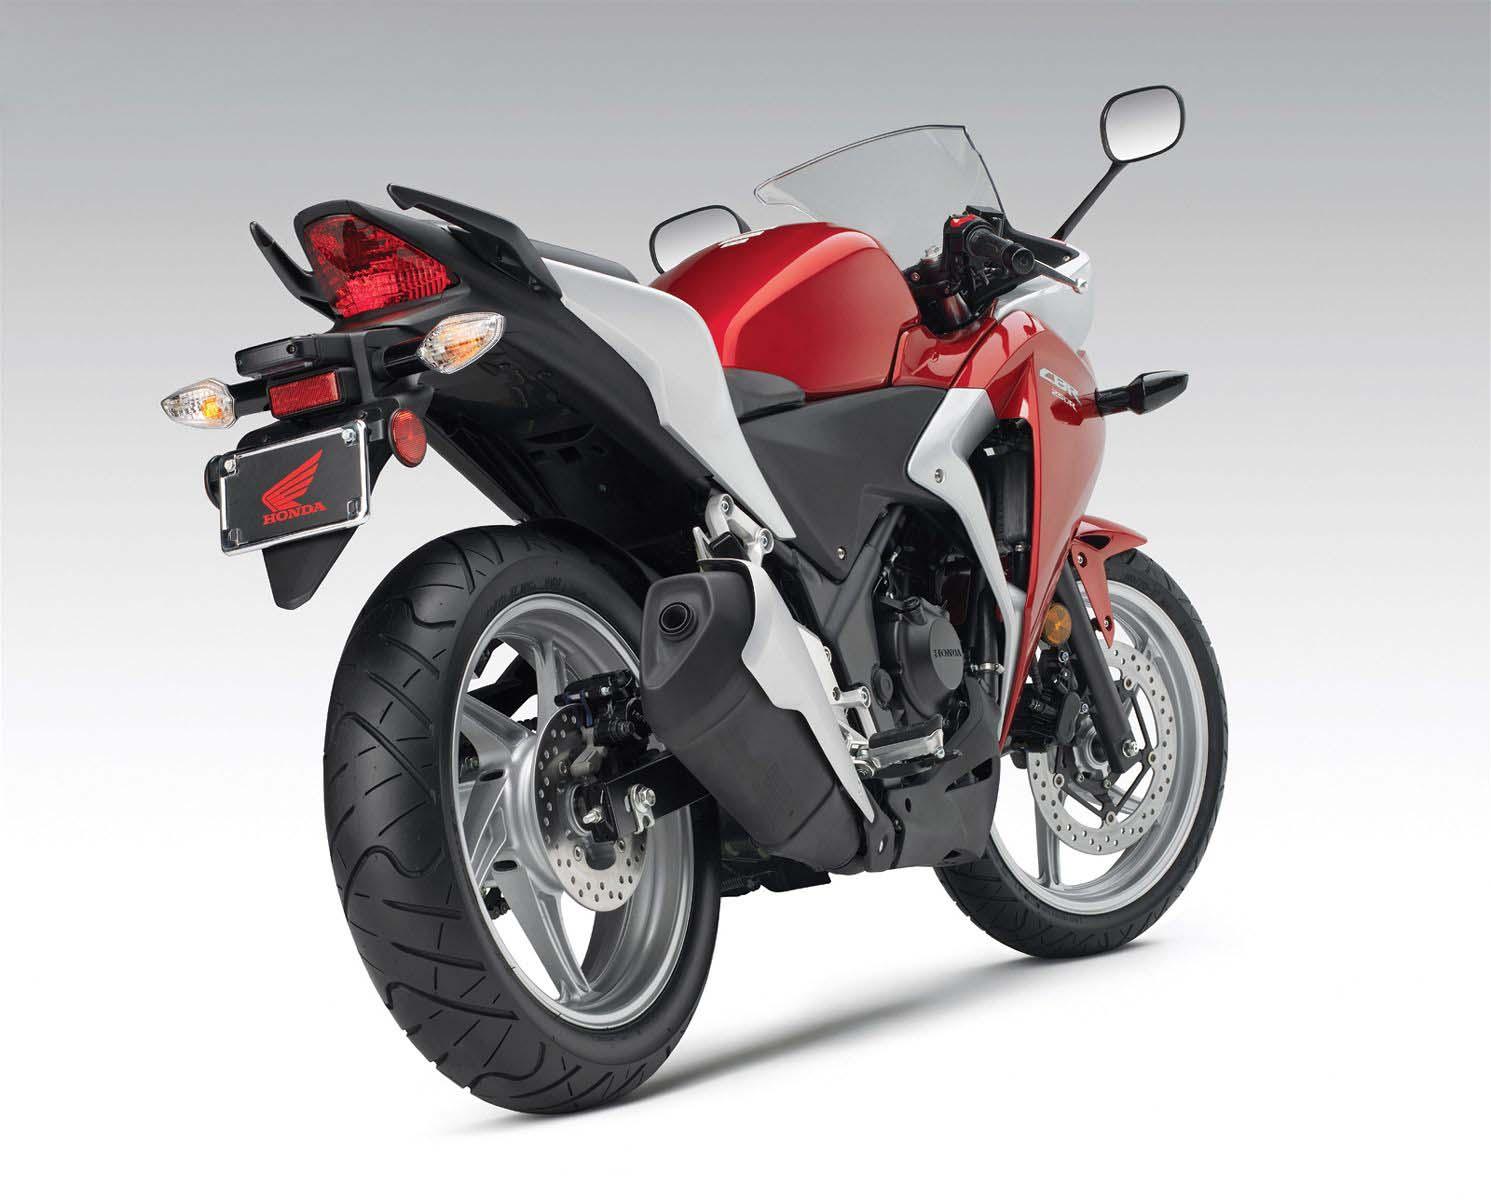 Bikeguru June 2013 Hand Guard New Honda Cbr 250rr Cbr250 Review By Sunil Joseph